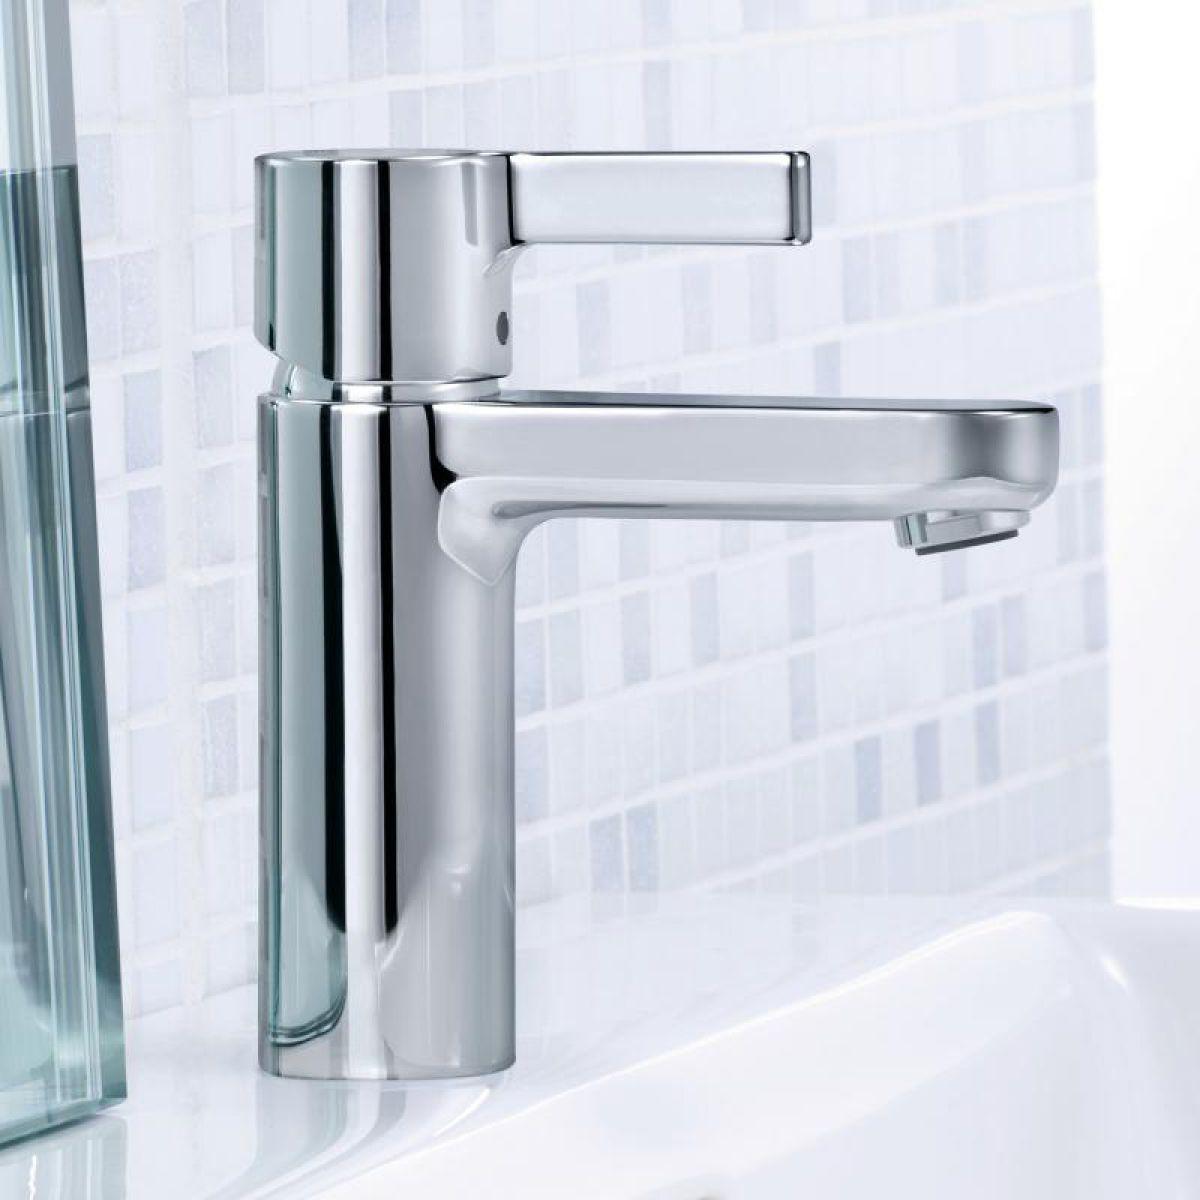 Hansgrohe Metris S 100 Basin Mixer Tap : UK Bathrooms